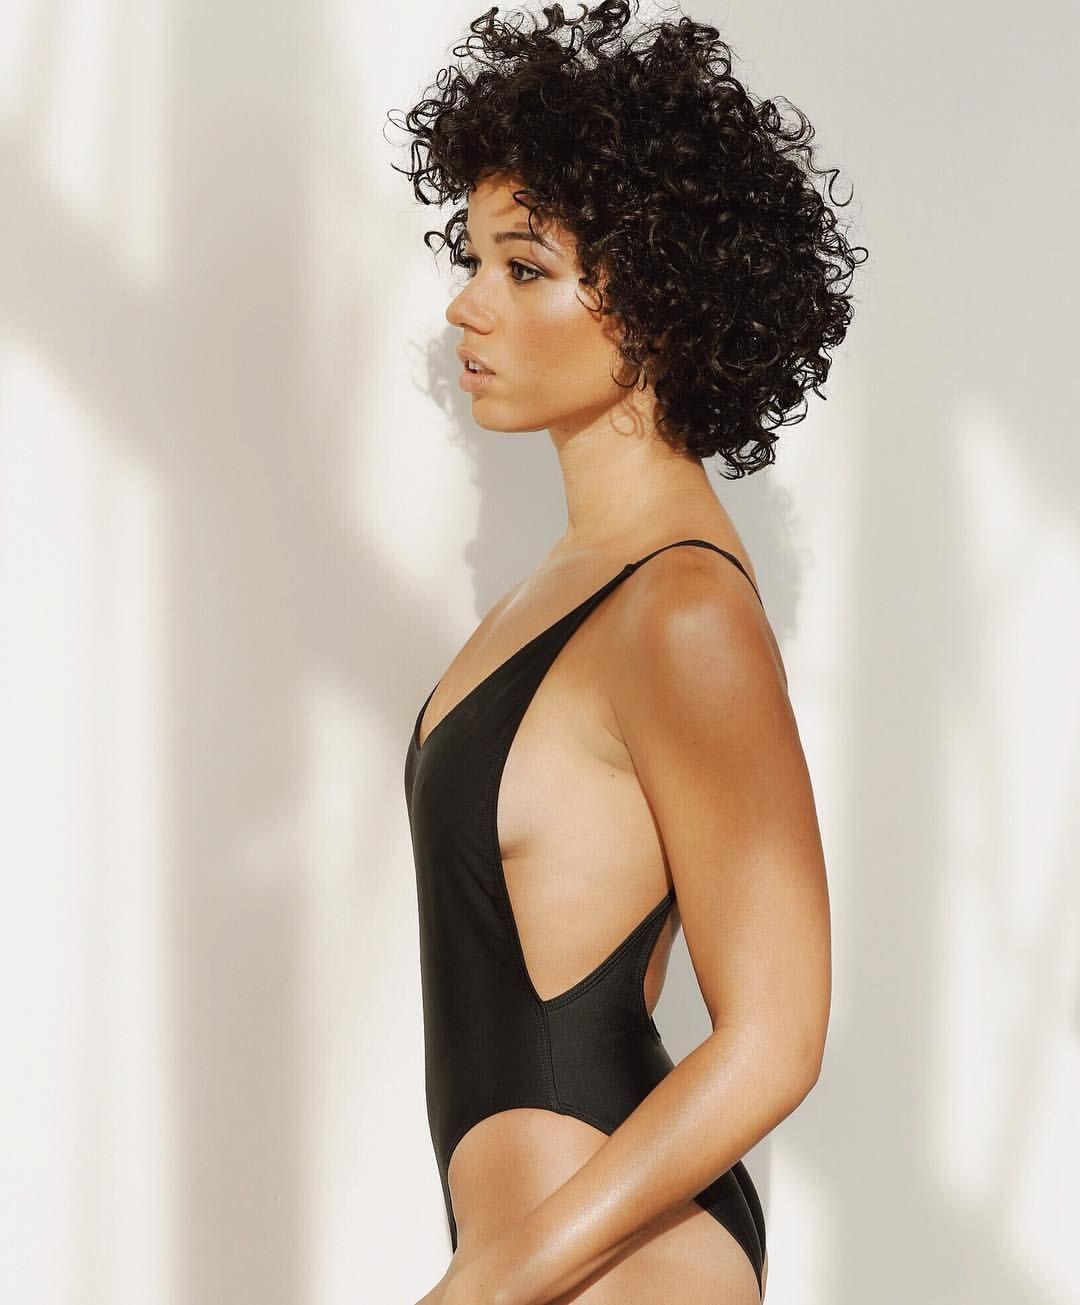 Alisha Naked alisha wainwright | alisha wainwright, hair designs, photoshoot